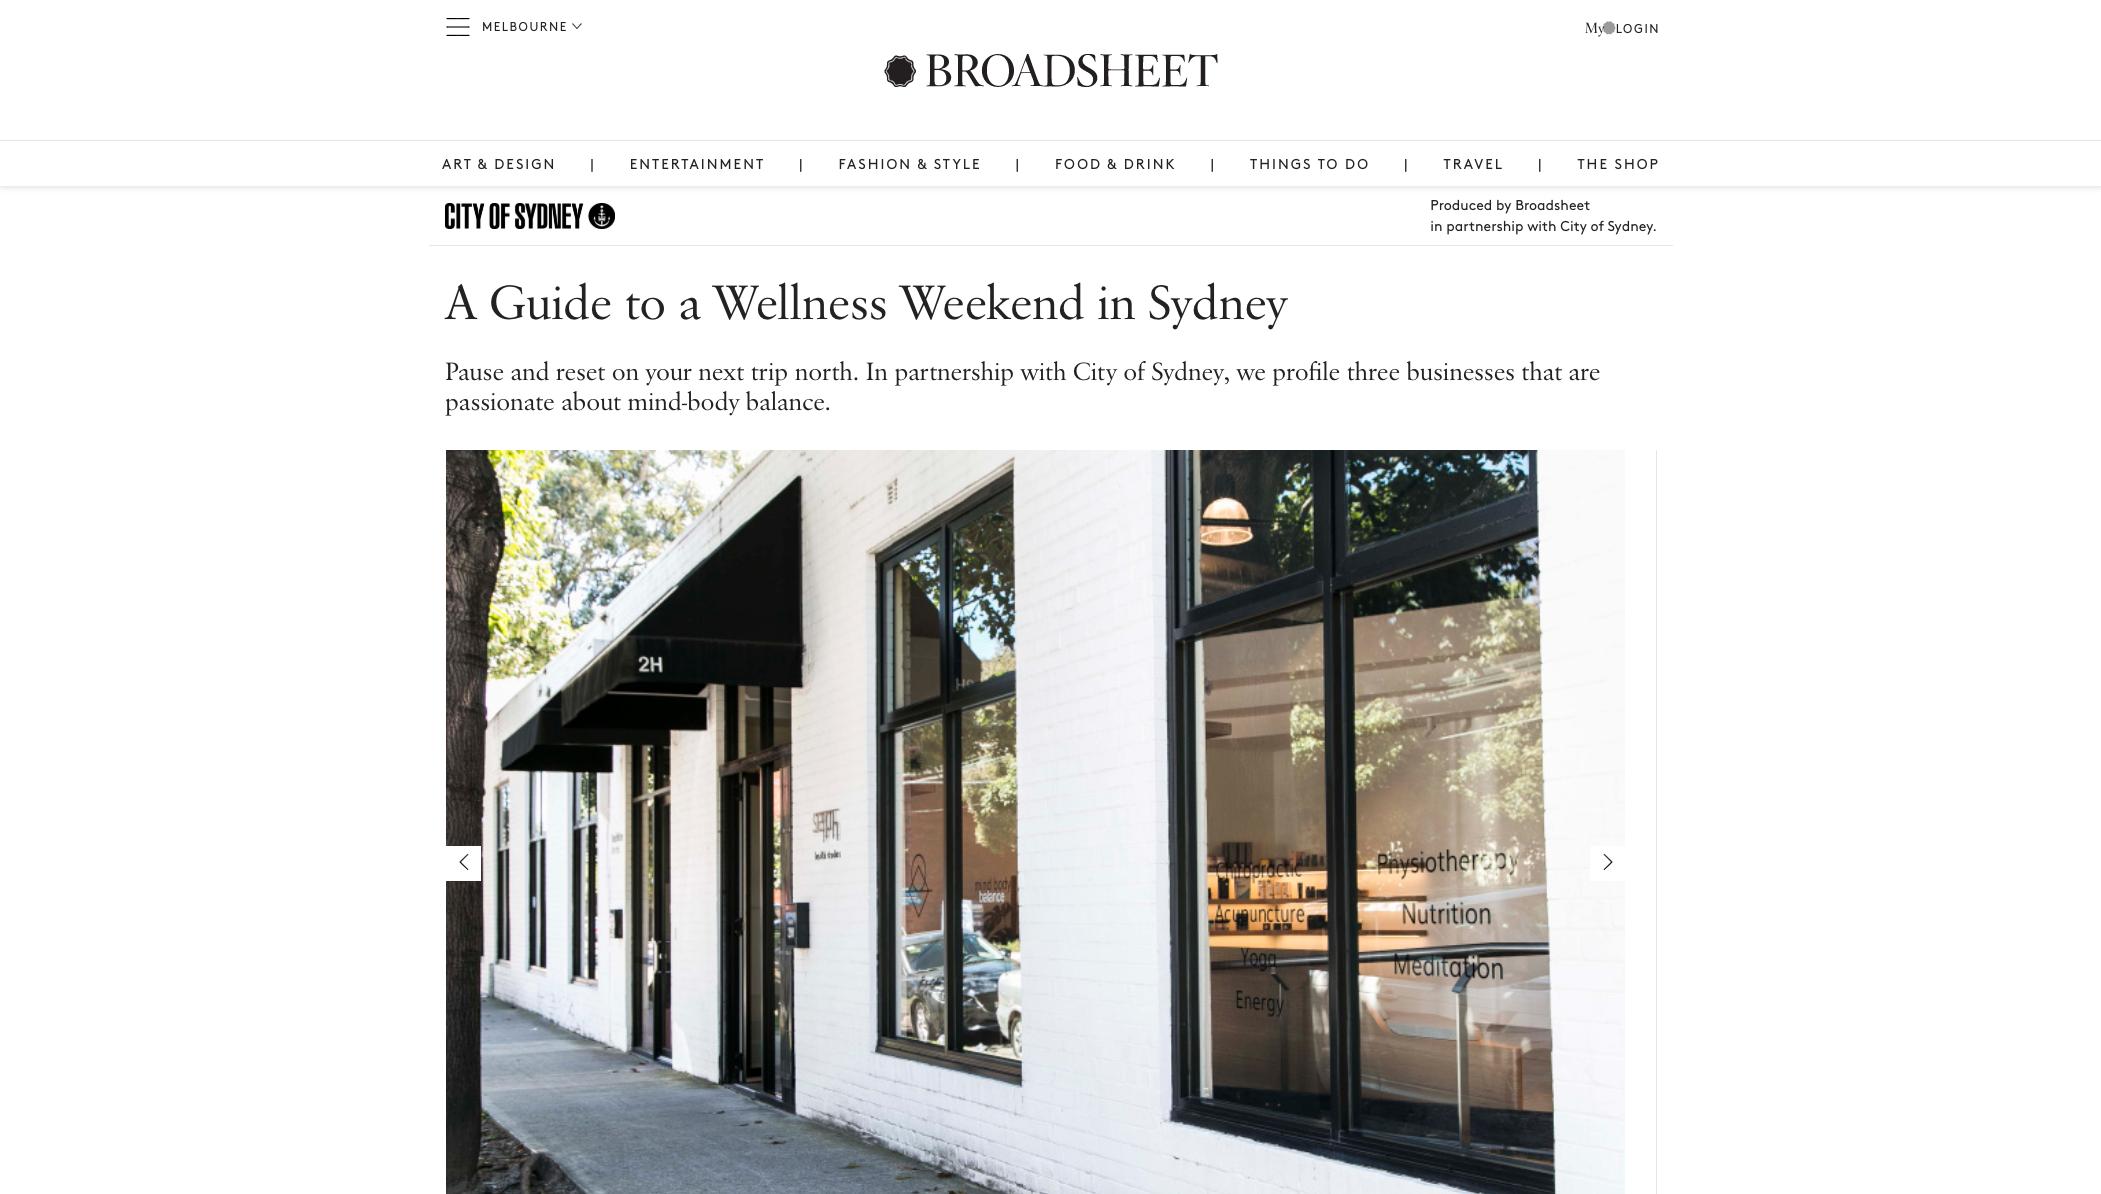 A guide to weekend wellness in Sydney - Broadsheet Selph Health Studios